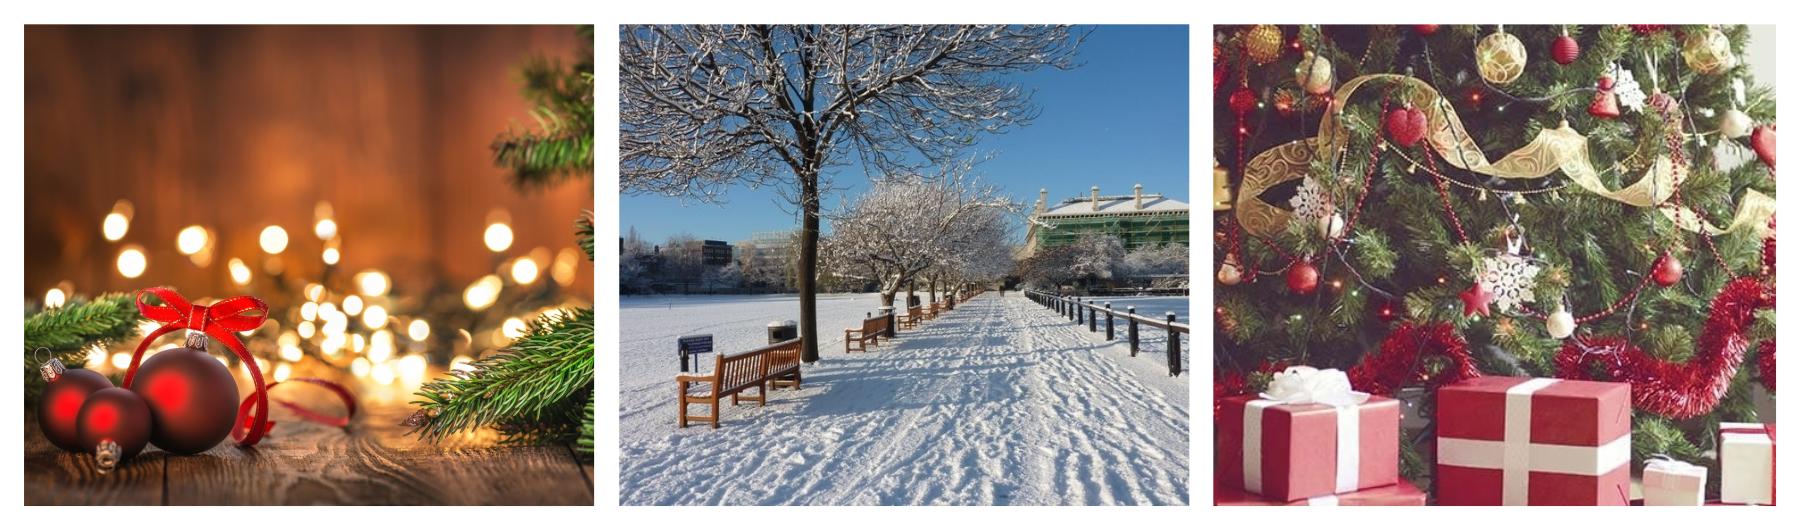 Christmas Commons for Alumni & Friends - 4 December 2019